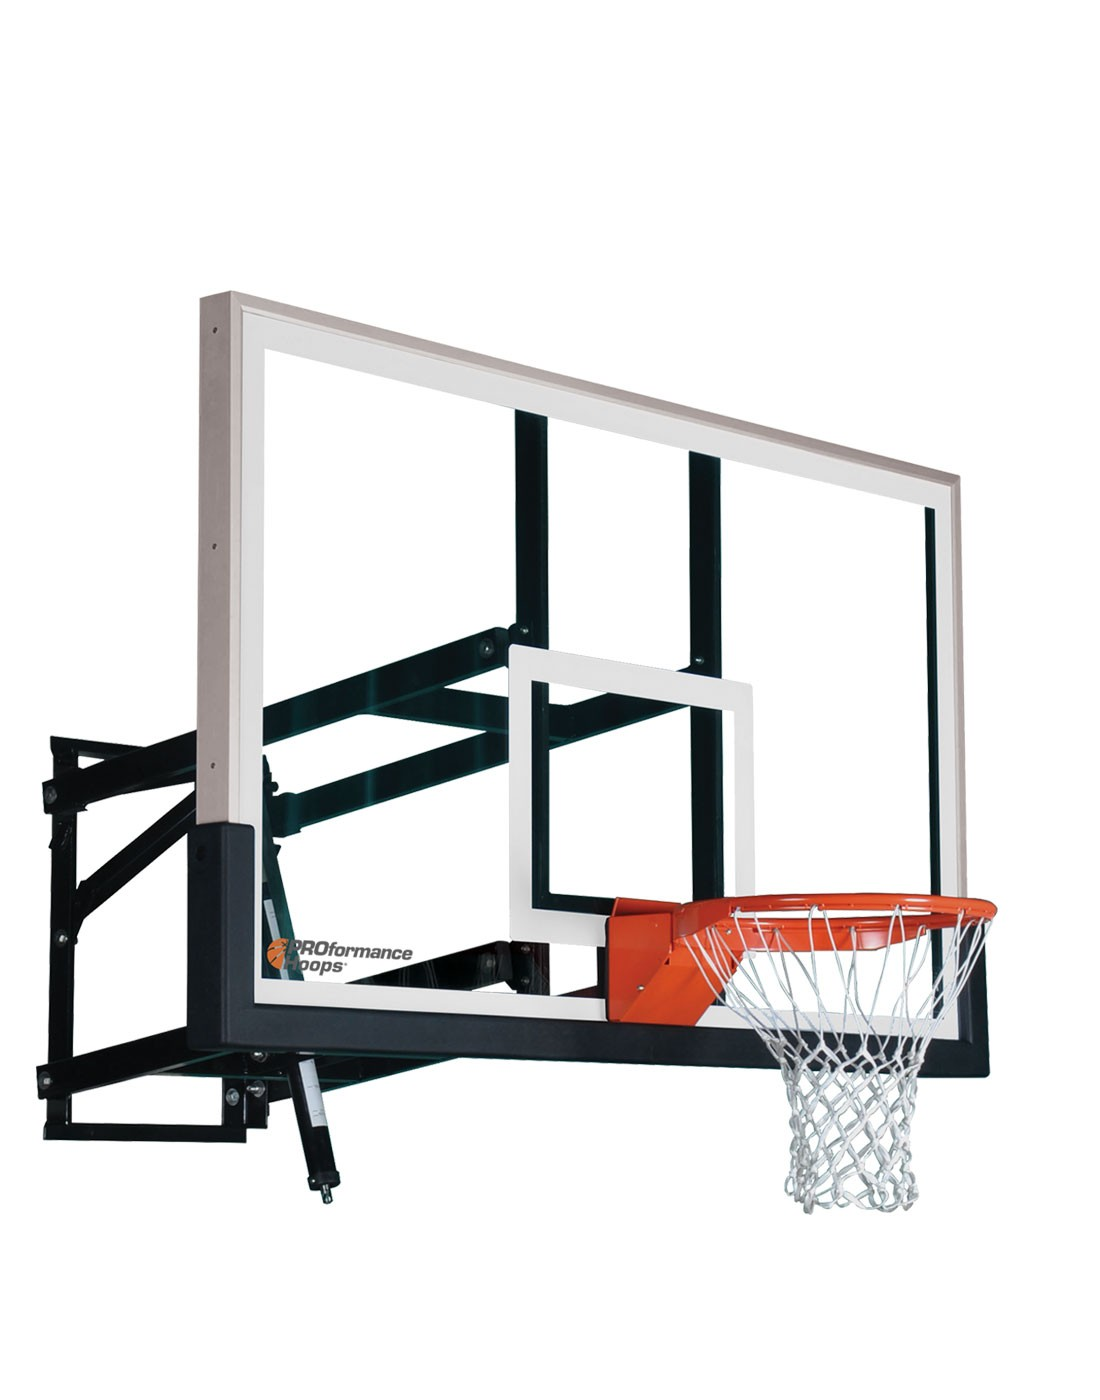 Wall Mount Wm60 Adjustable Basketball Hoop With 60 Inch